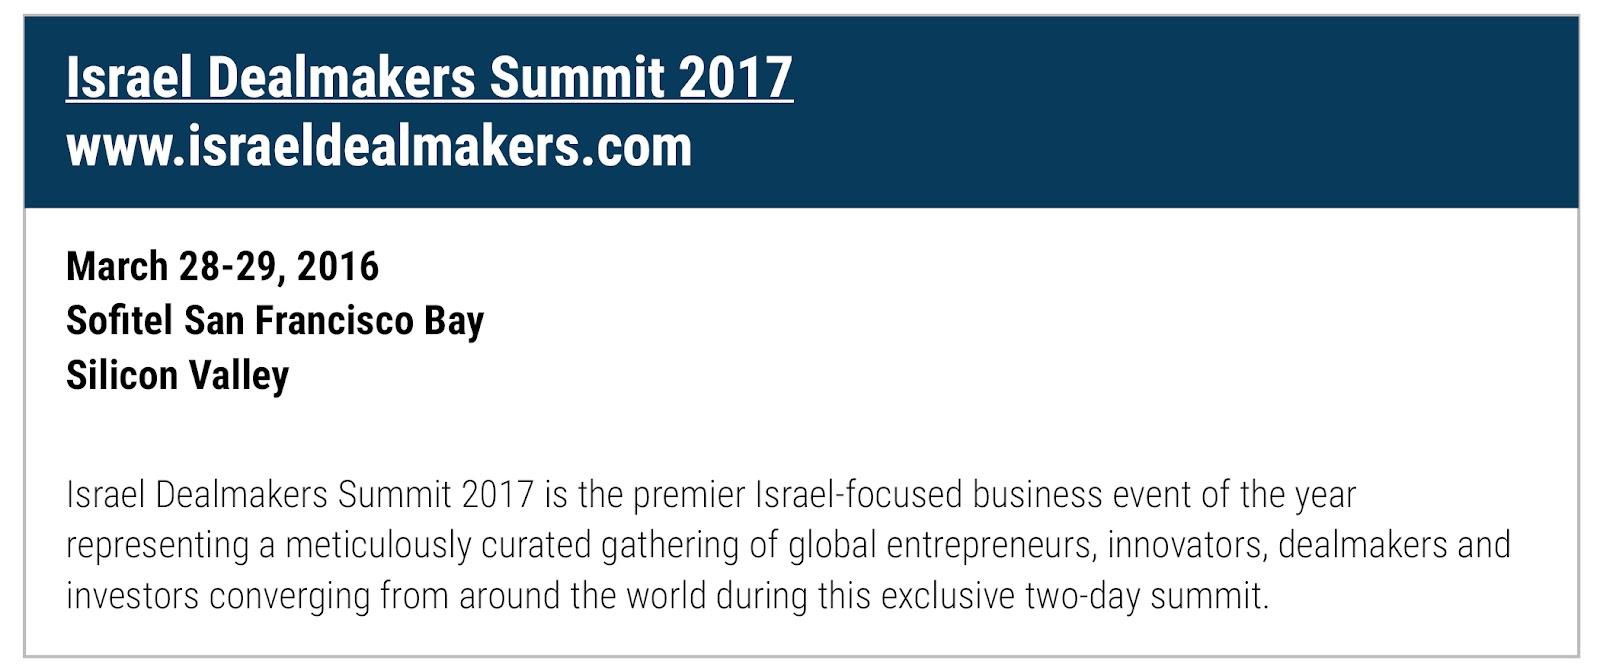 www.israeldealmakers.com